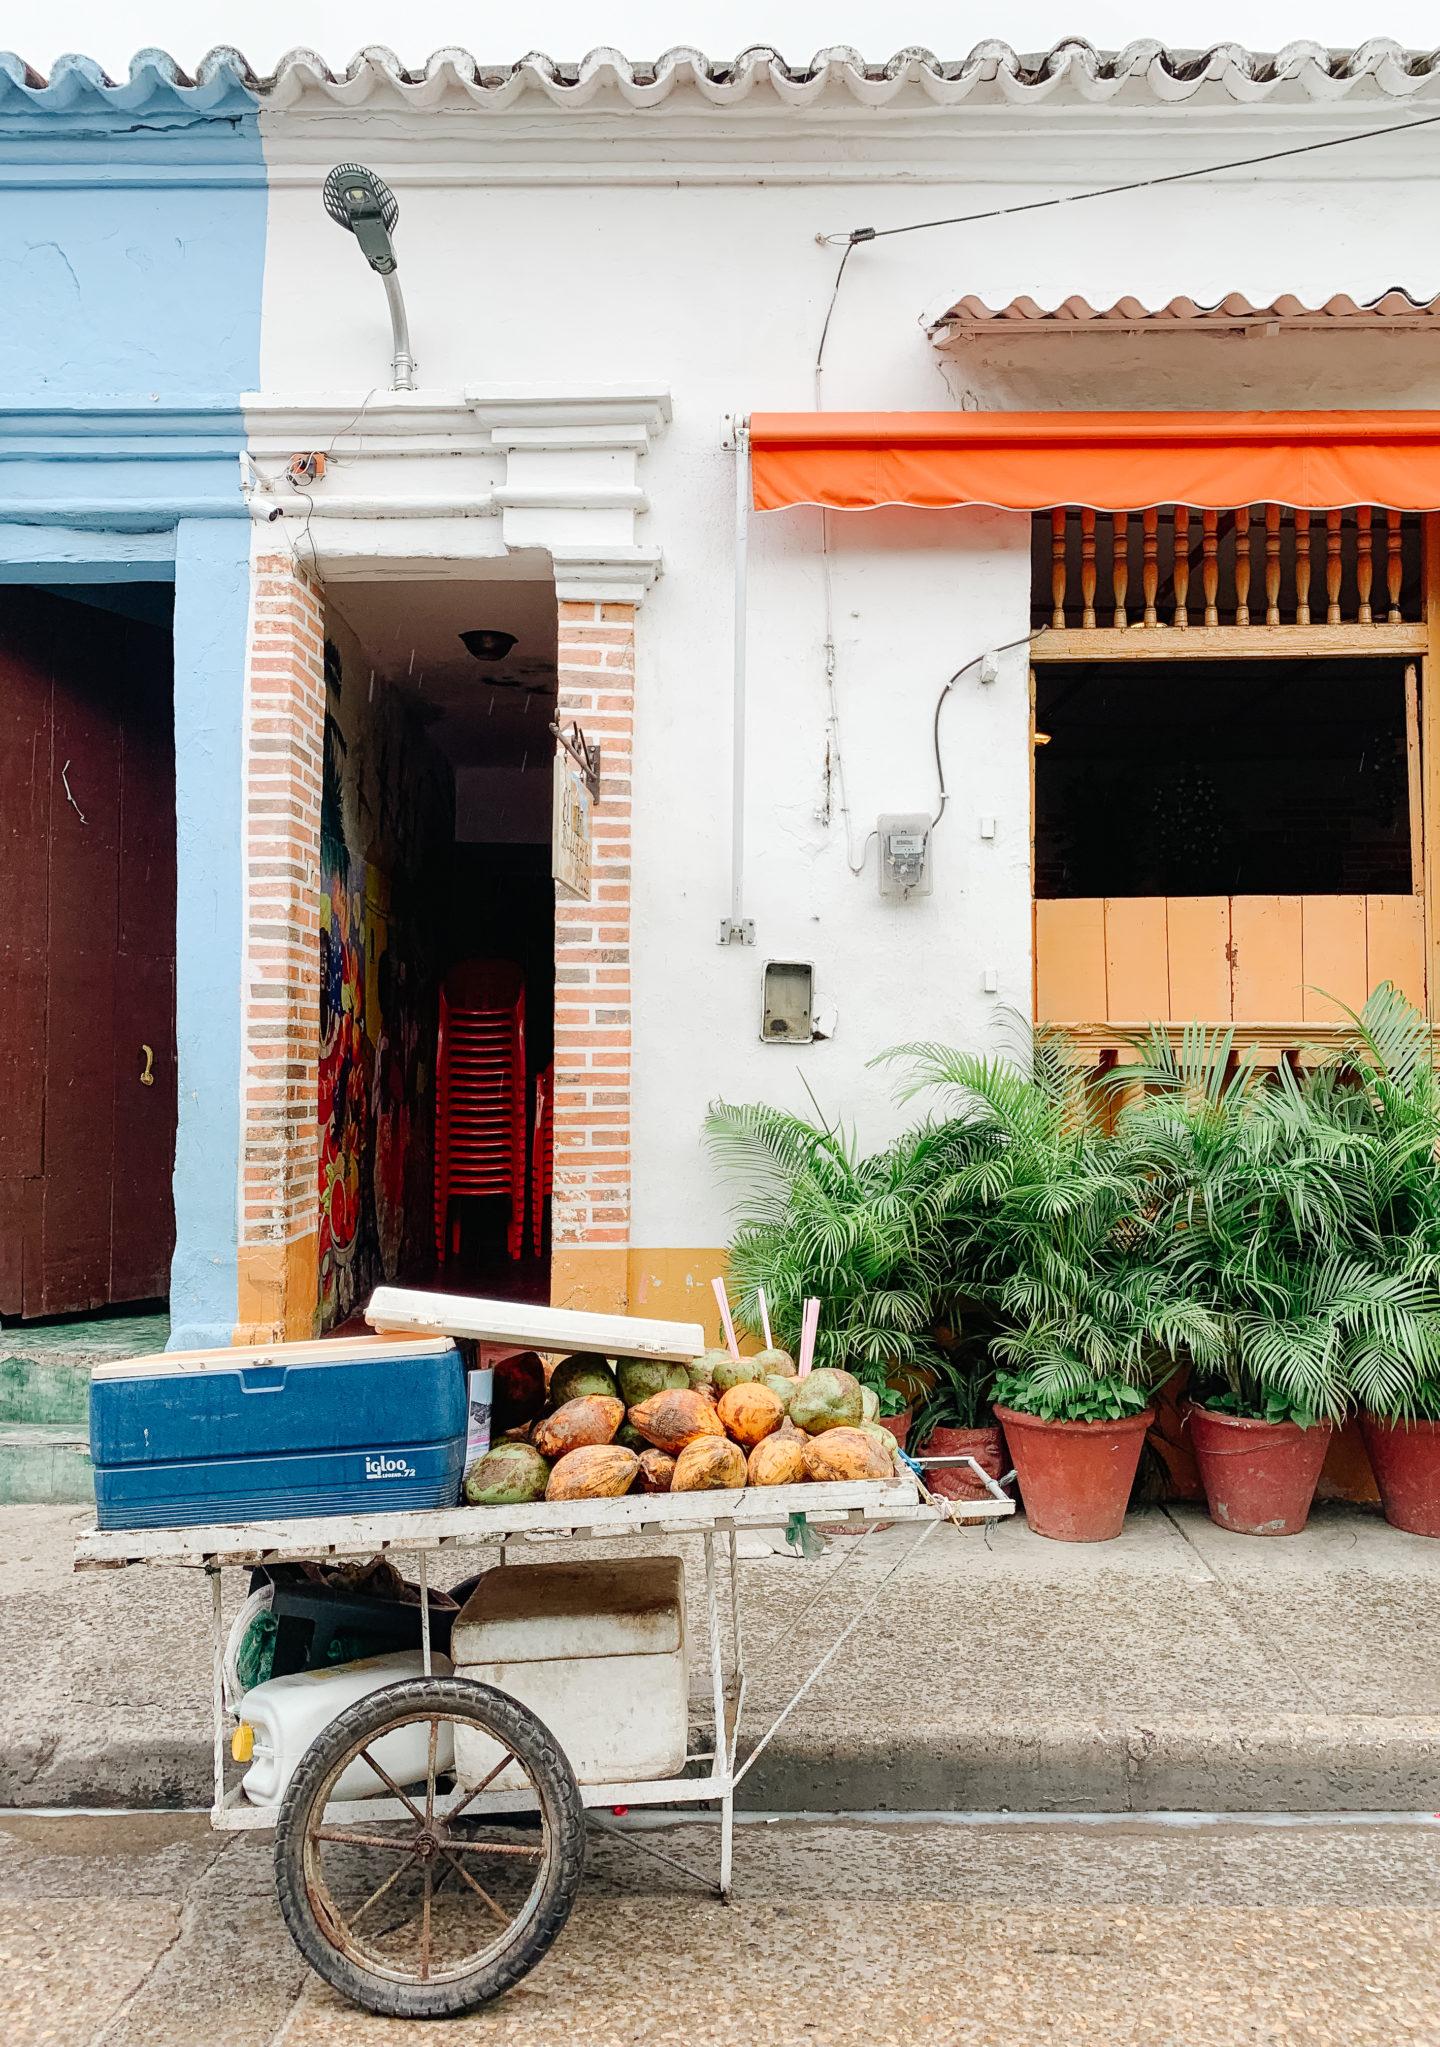 Cartagena, the new trendy spot!